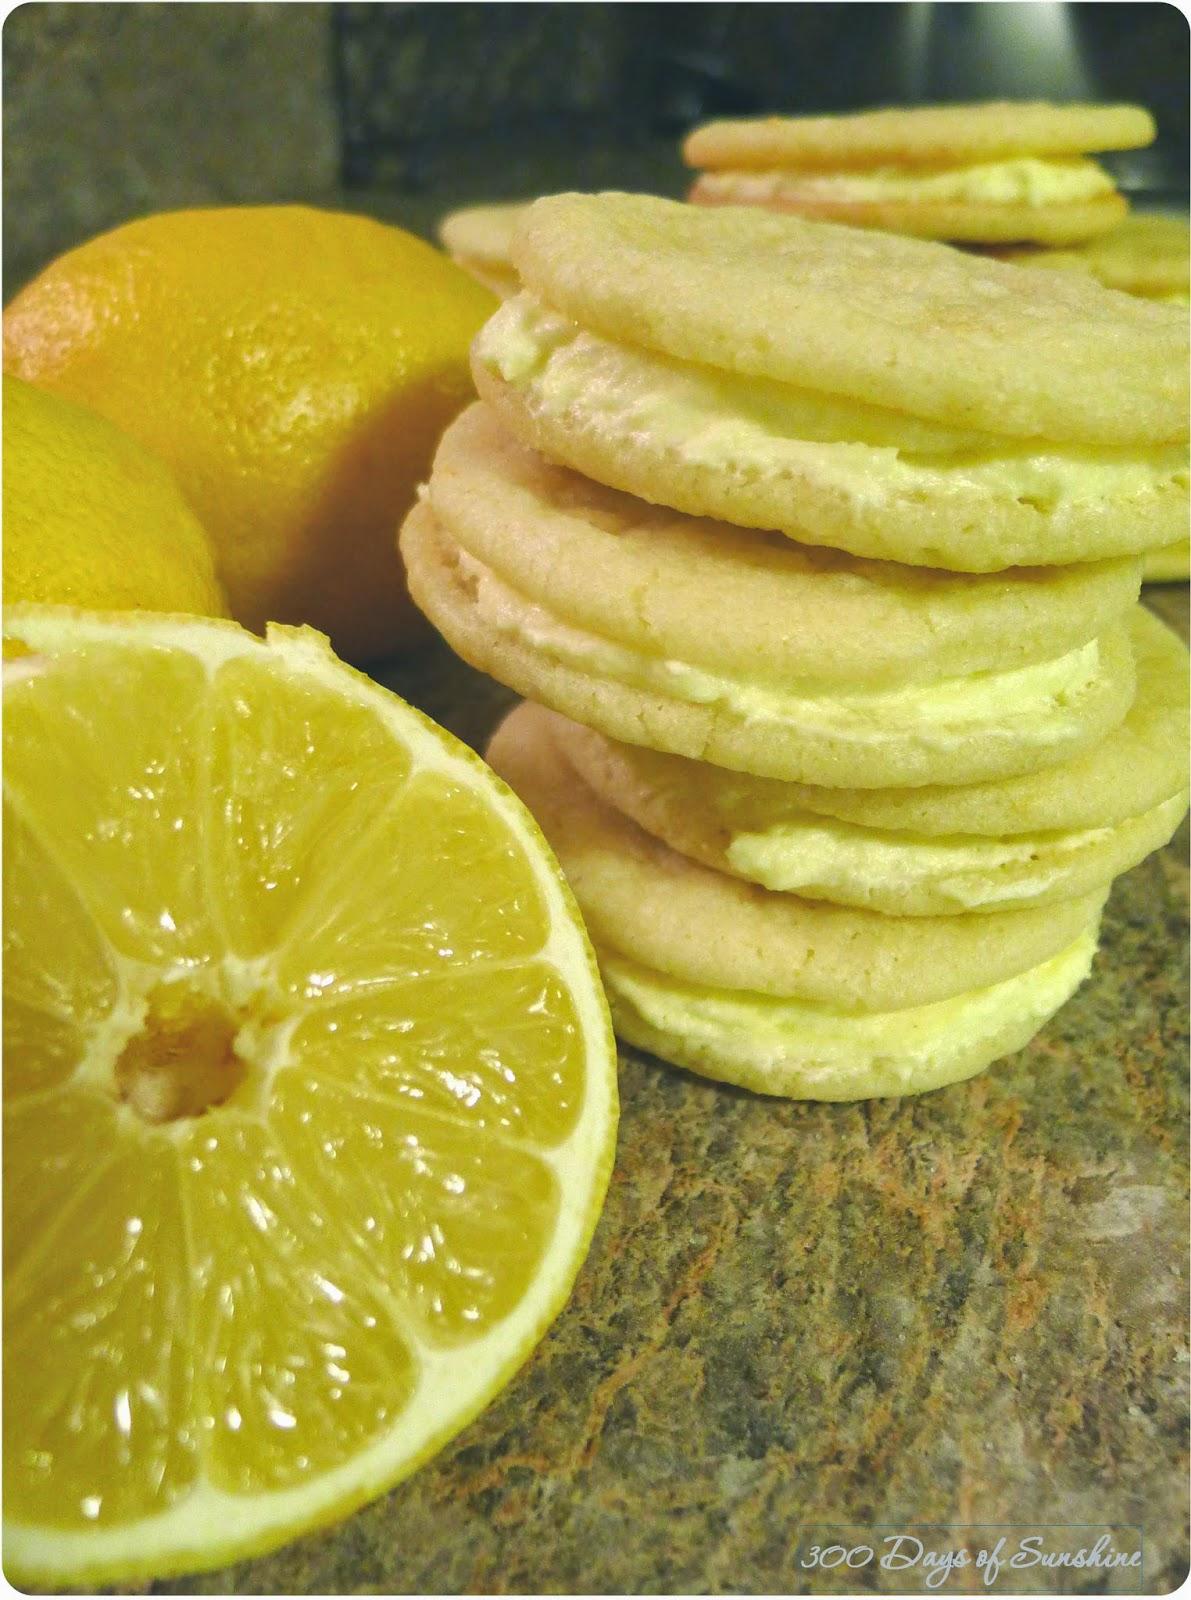 300 Days of Sunshine: Lemon Sandwich Cookies